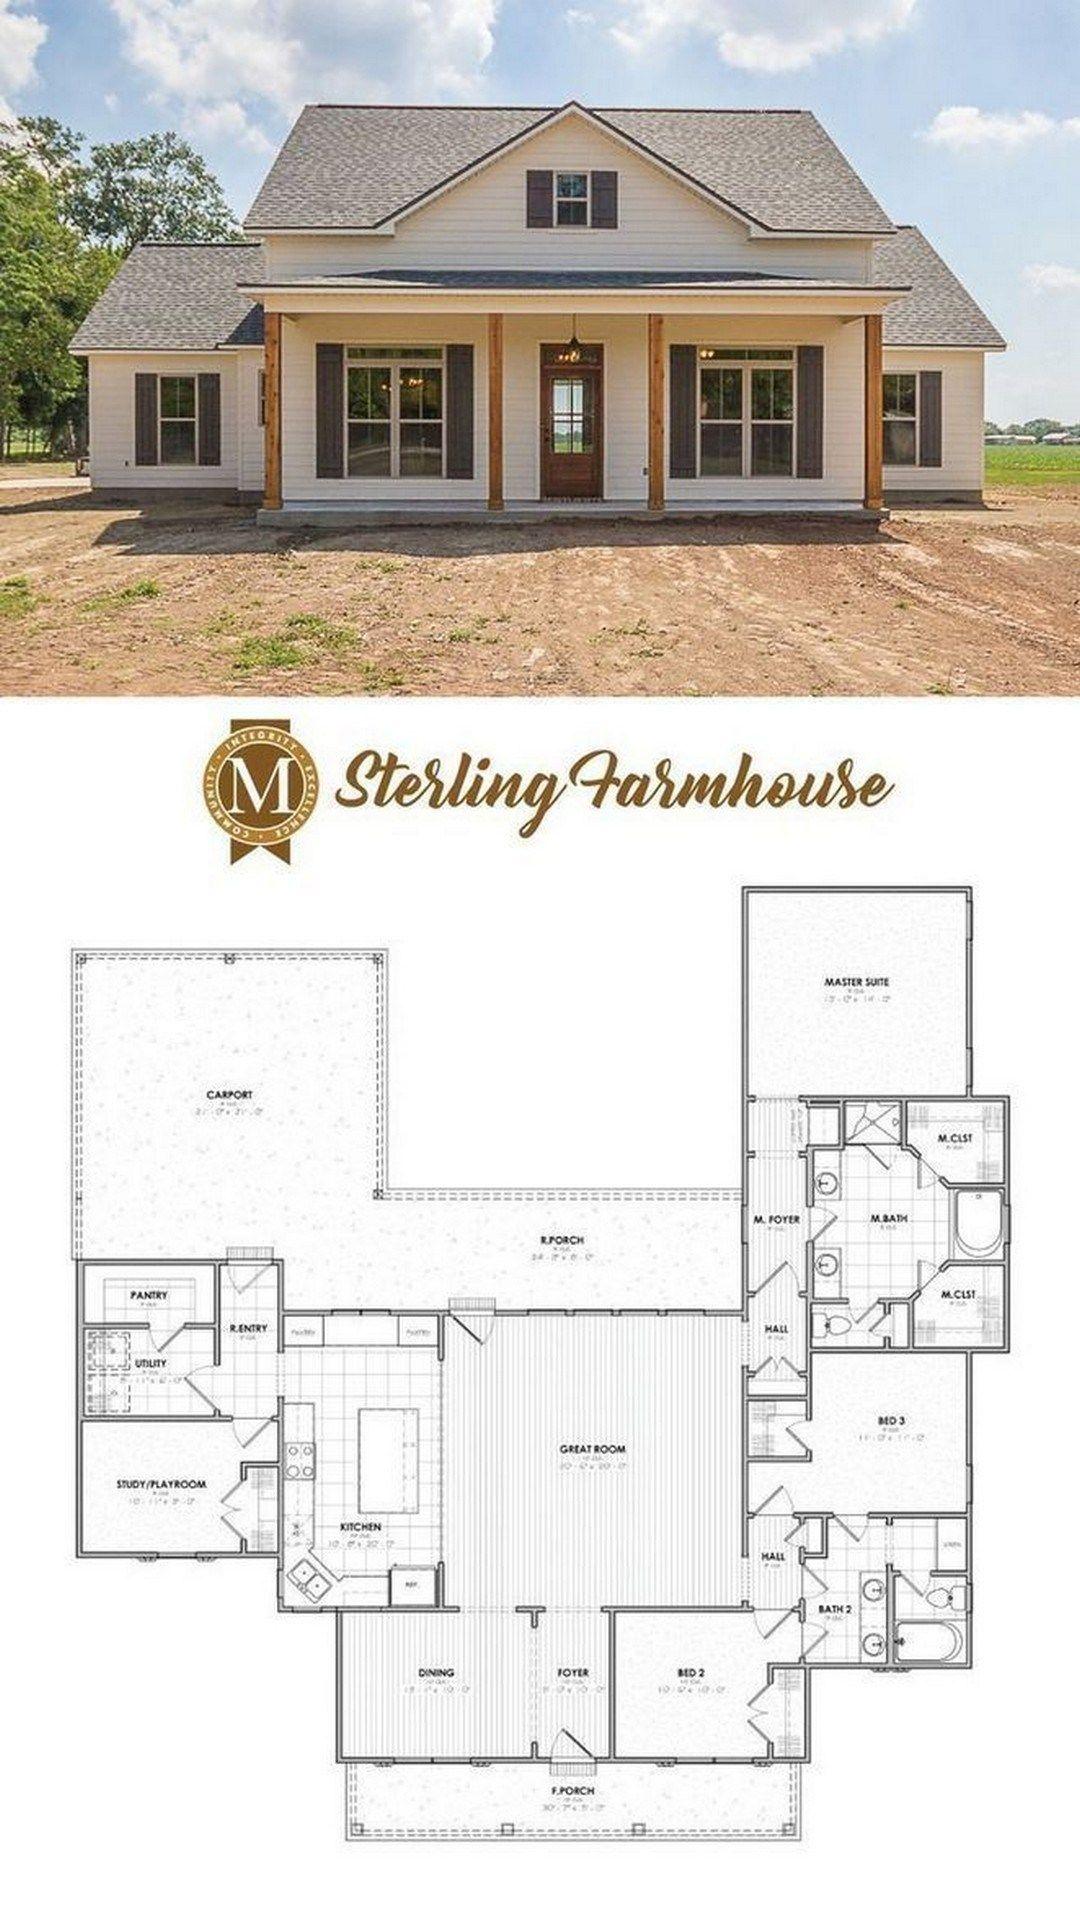 31 Farmhouse House Plans House Plans Farmhouse New House Plans